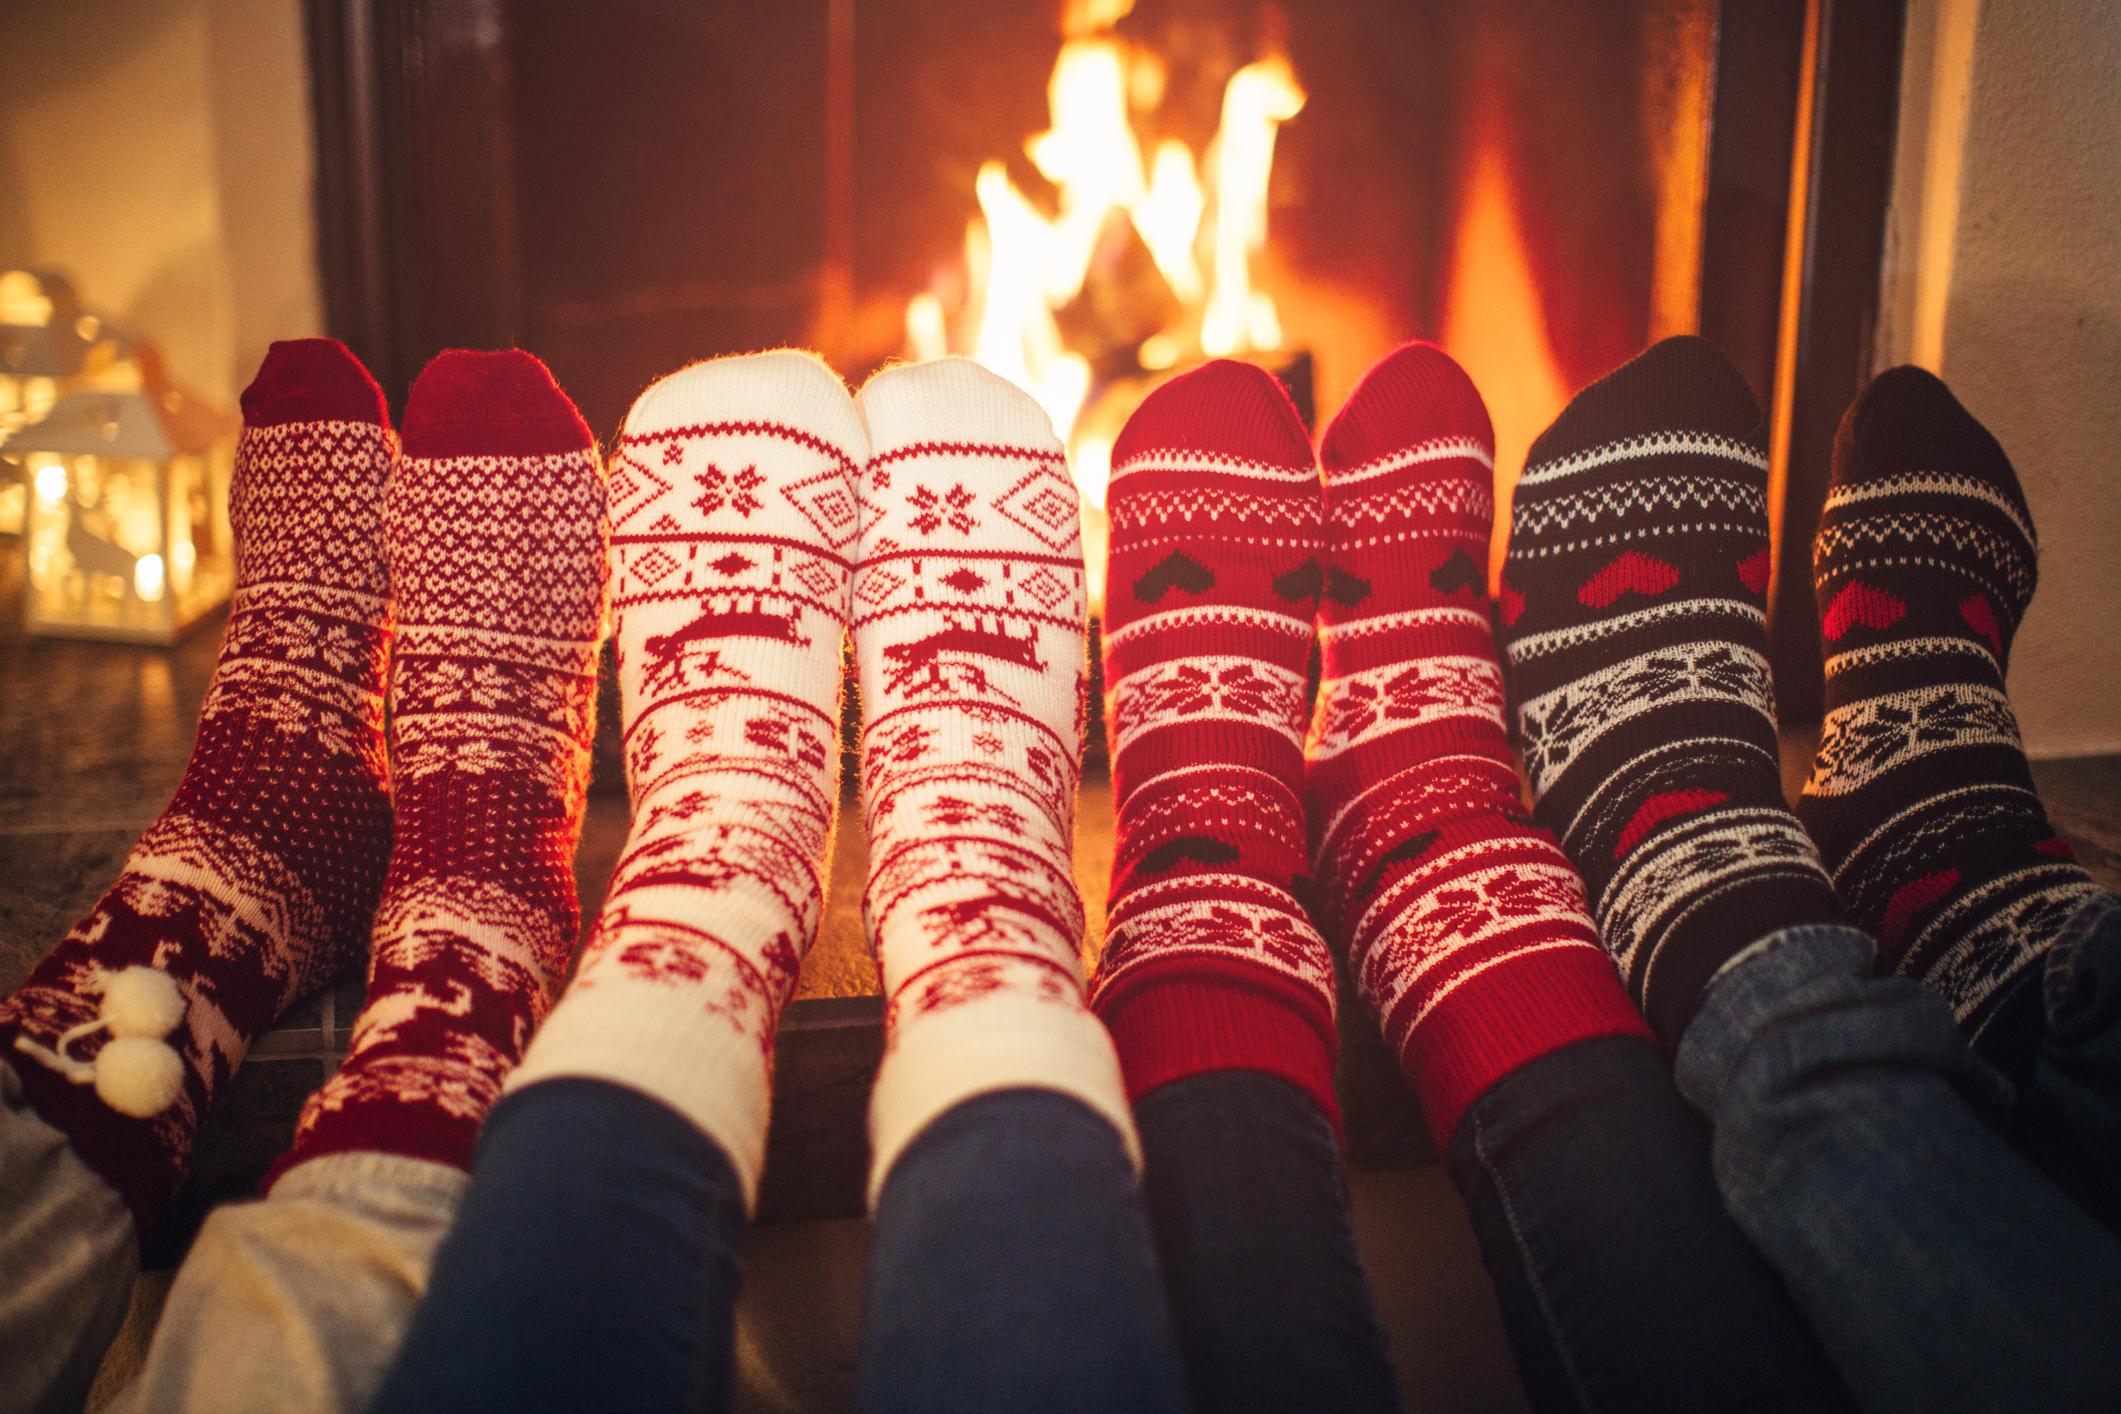 Fire-with-feet.jpg